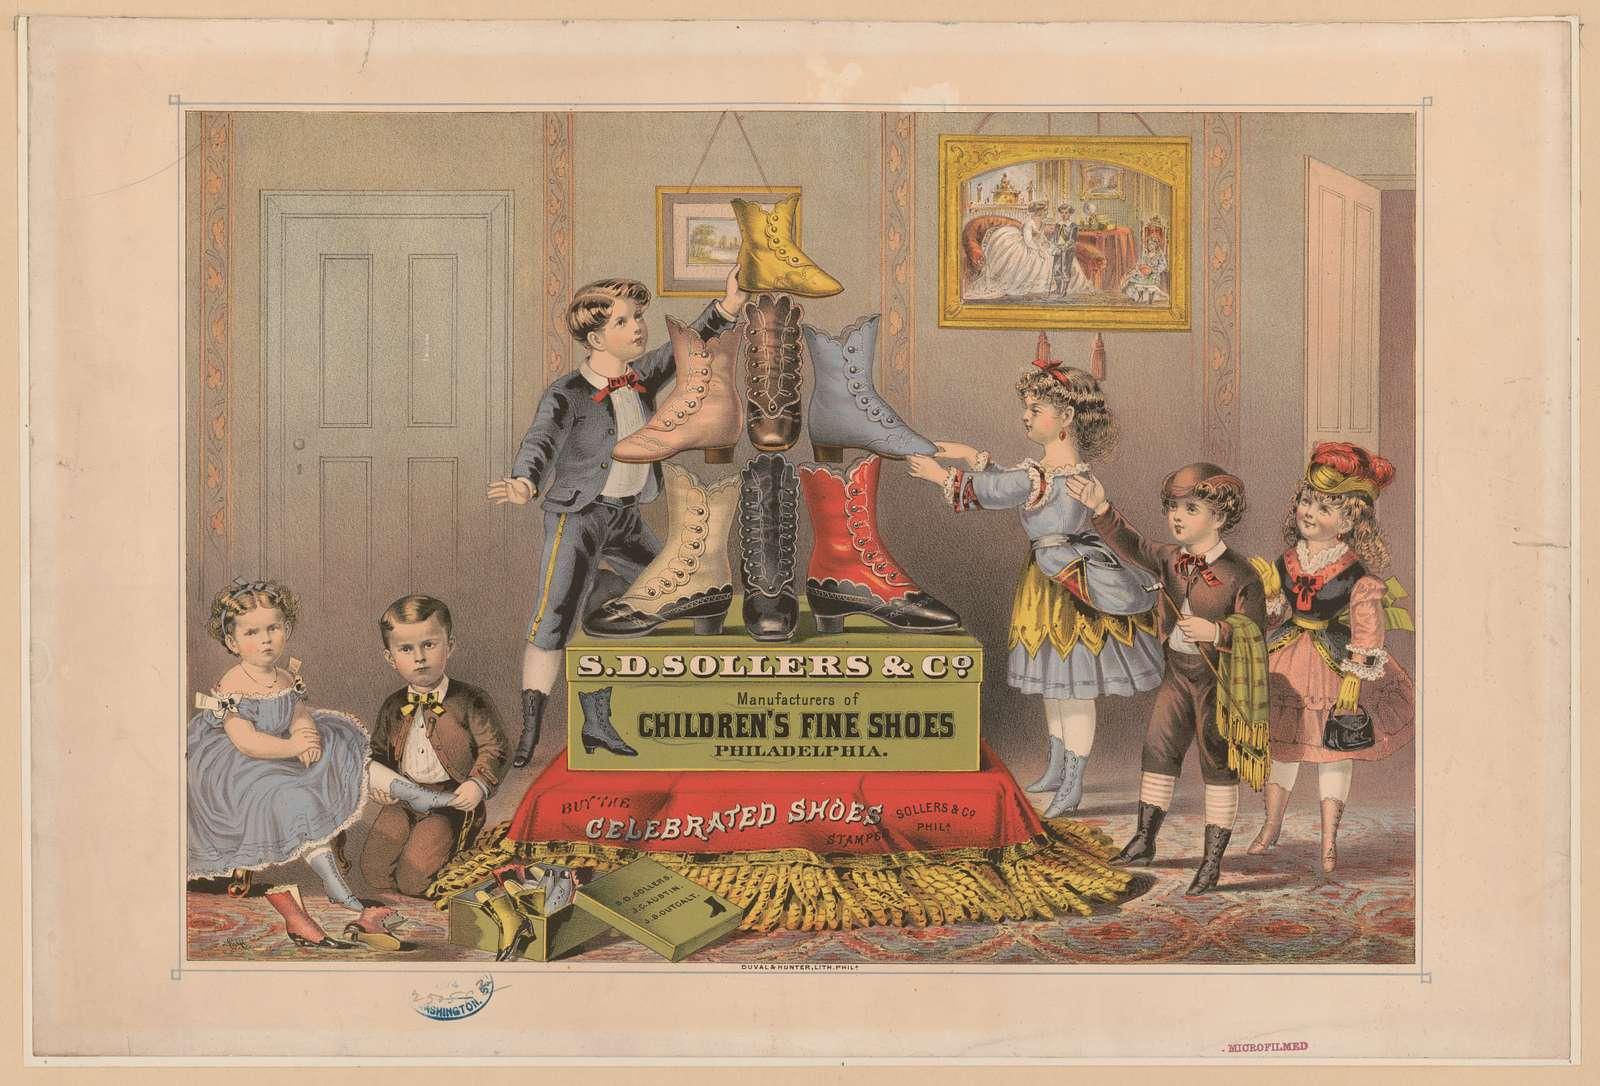 S.D. Sollers & Co. manufacturers of children's fine shoes, Philadelphia / E.C.